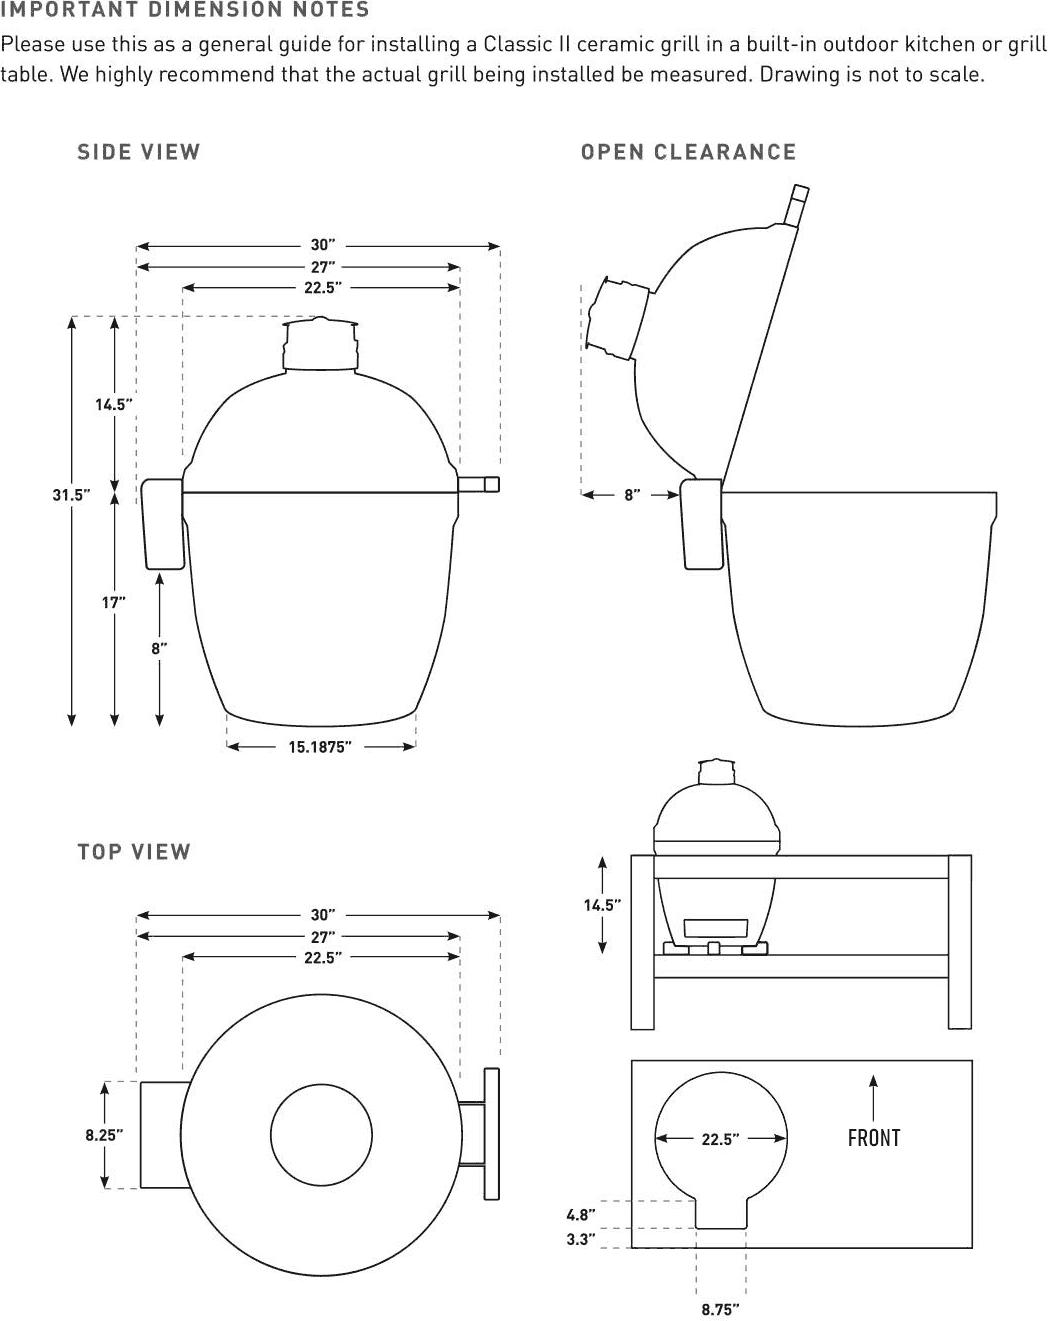 Kamado Joe Classic II Ceramic Grill Specifications